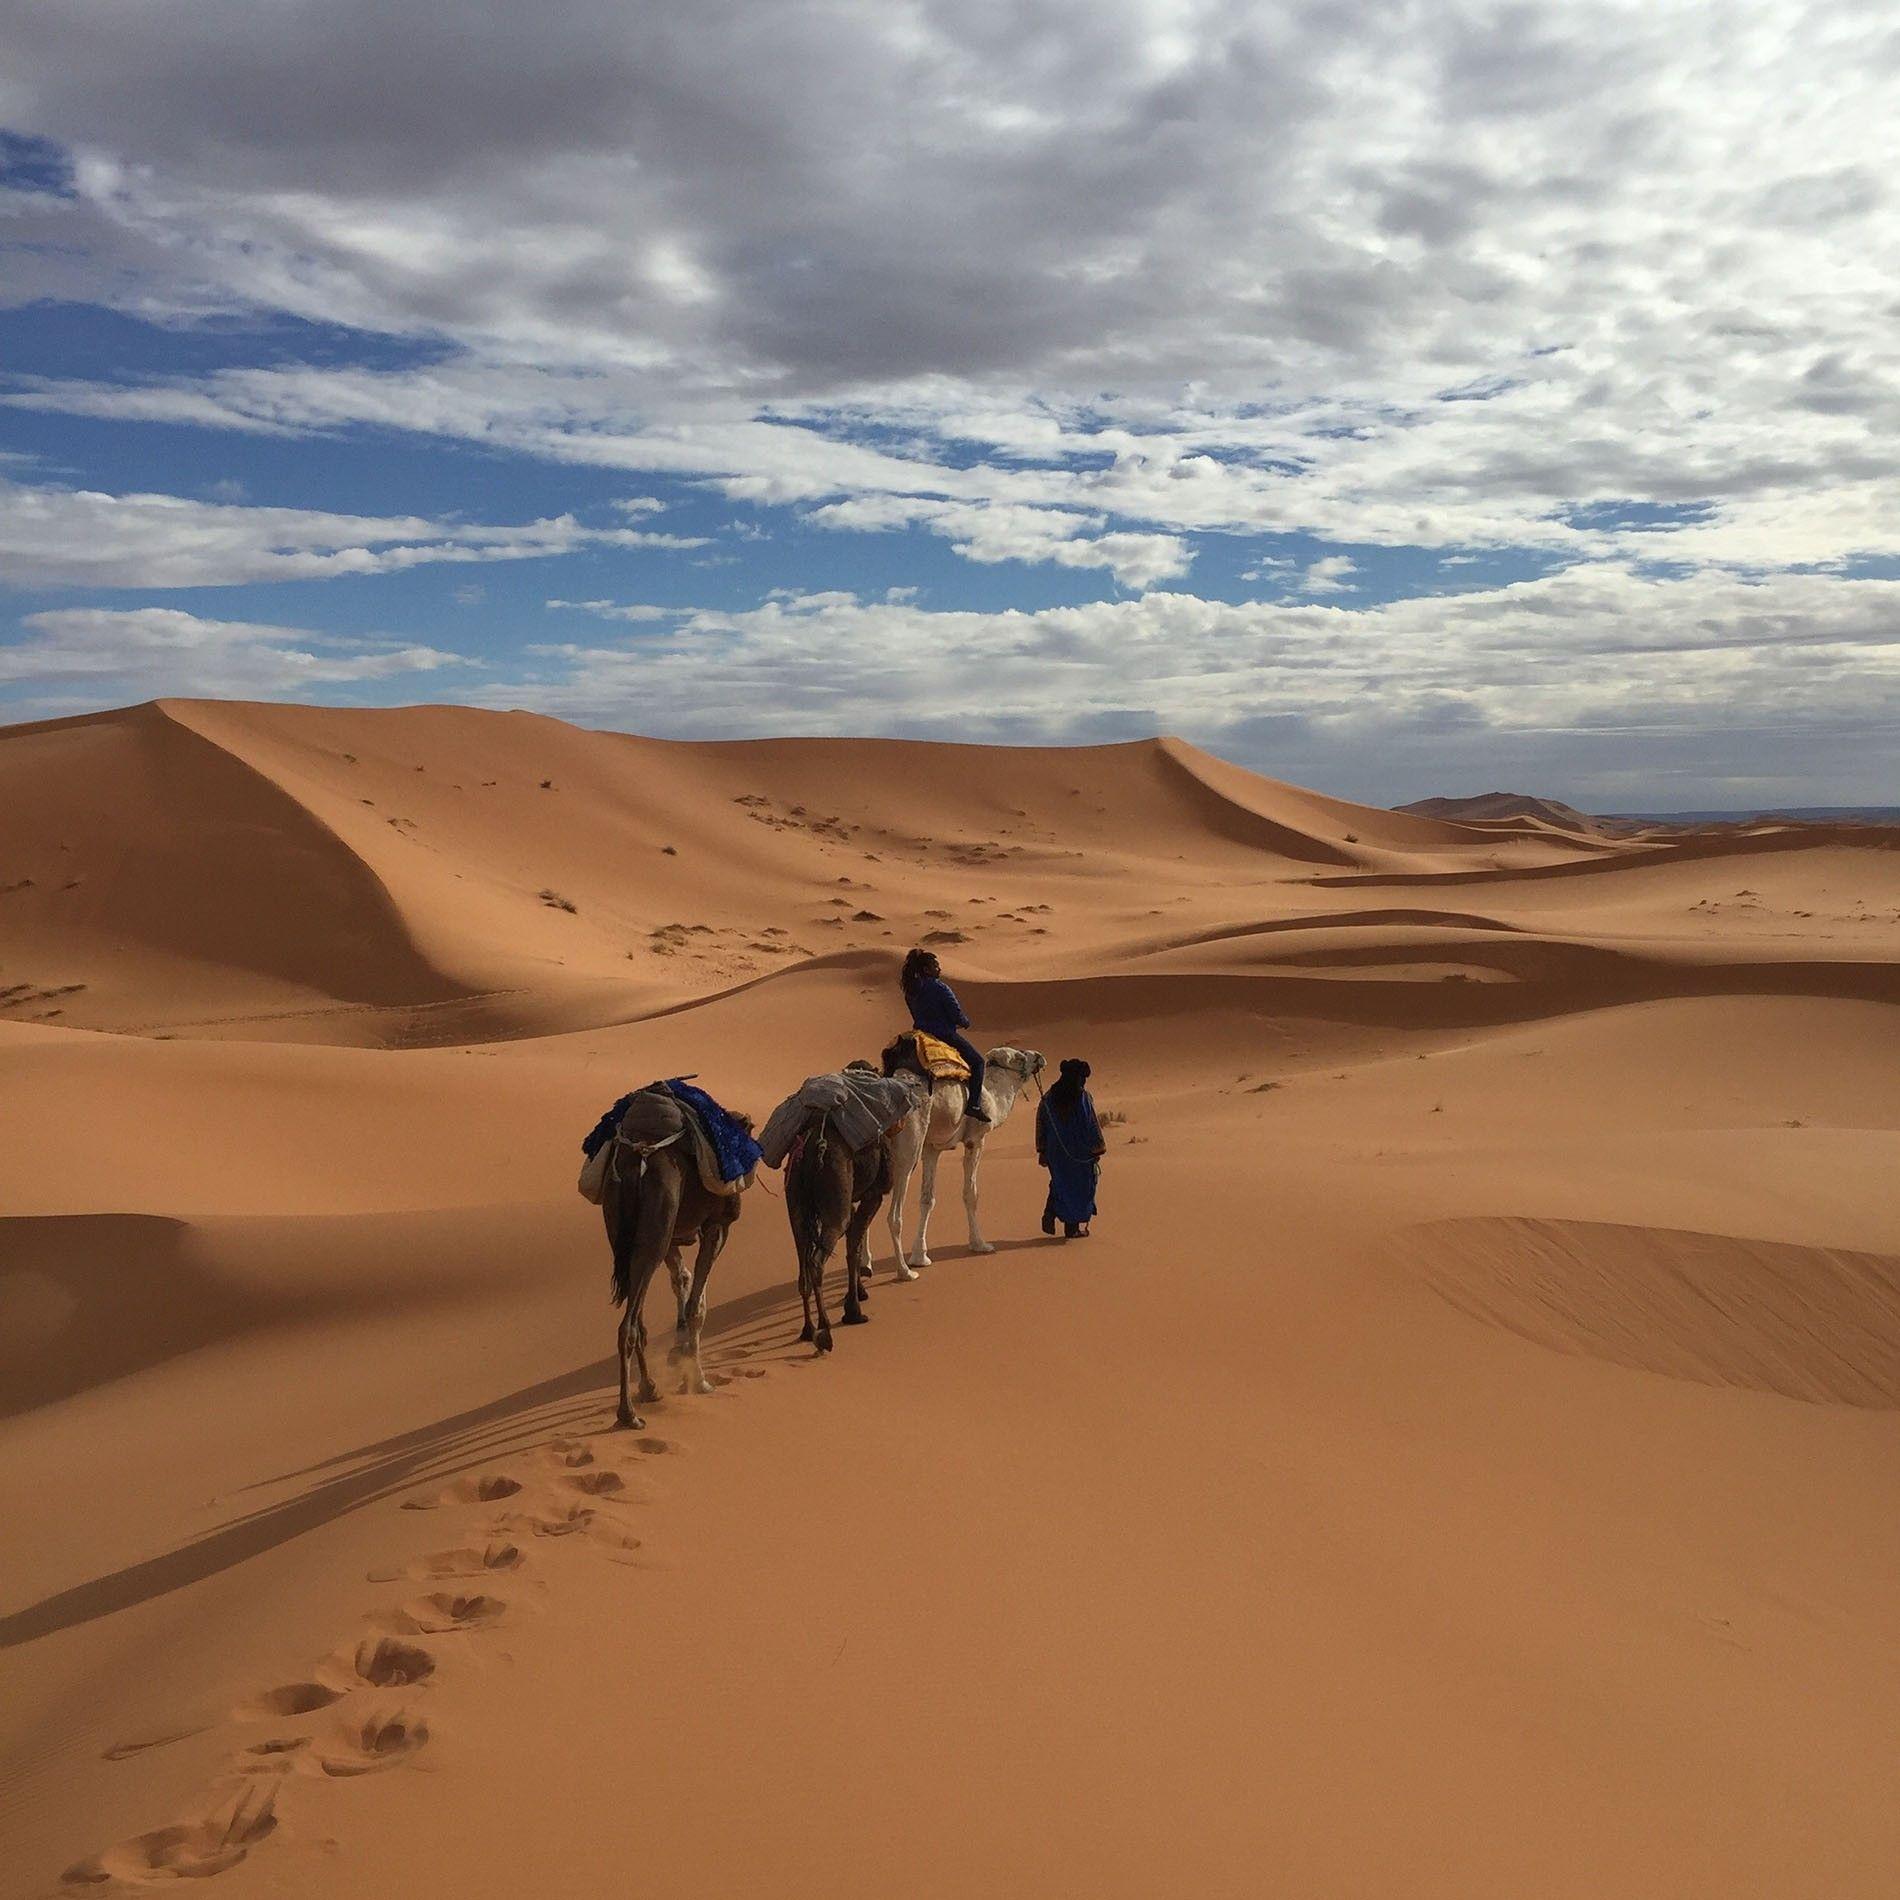 Alice Morrison trekking through Morocco